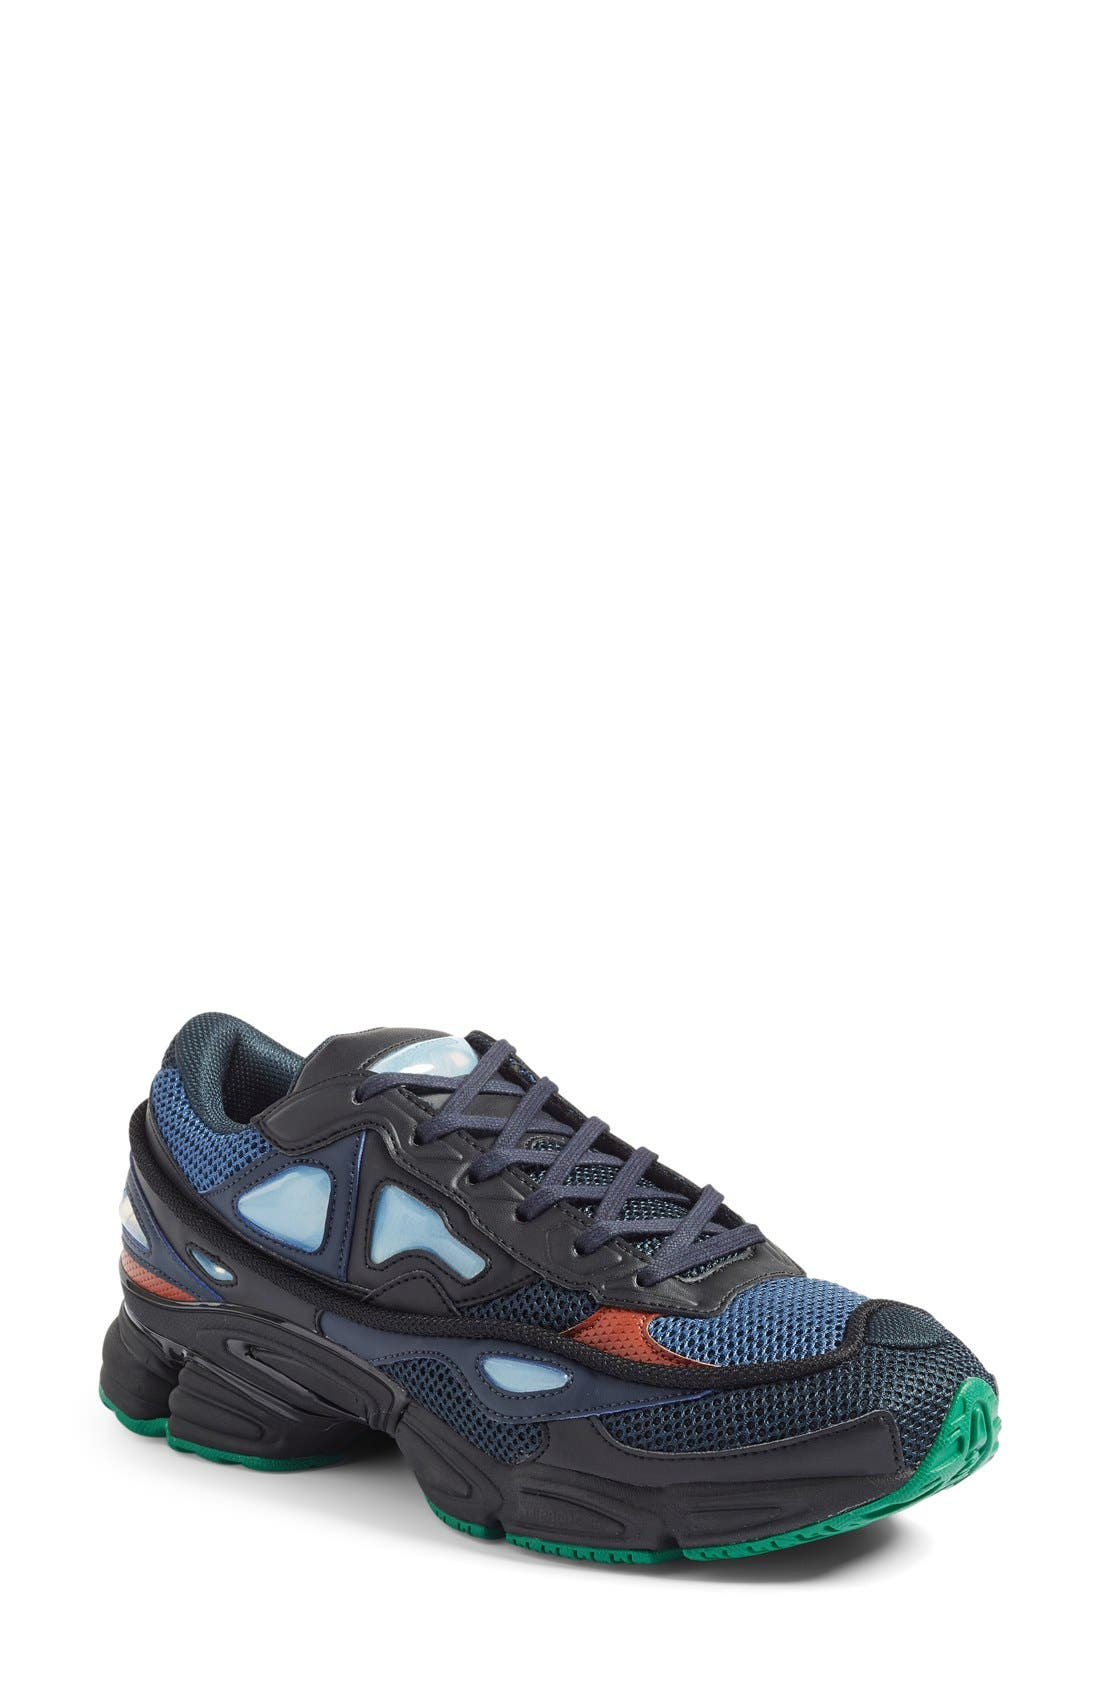 Main Image - adidas by Raf Simons Ozwego 2 Sneaker (Women)